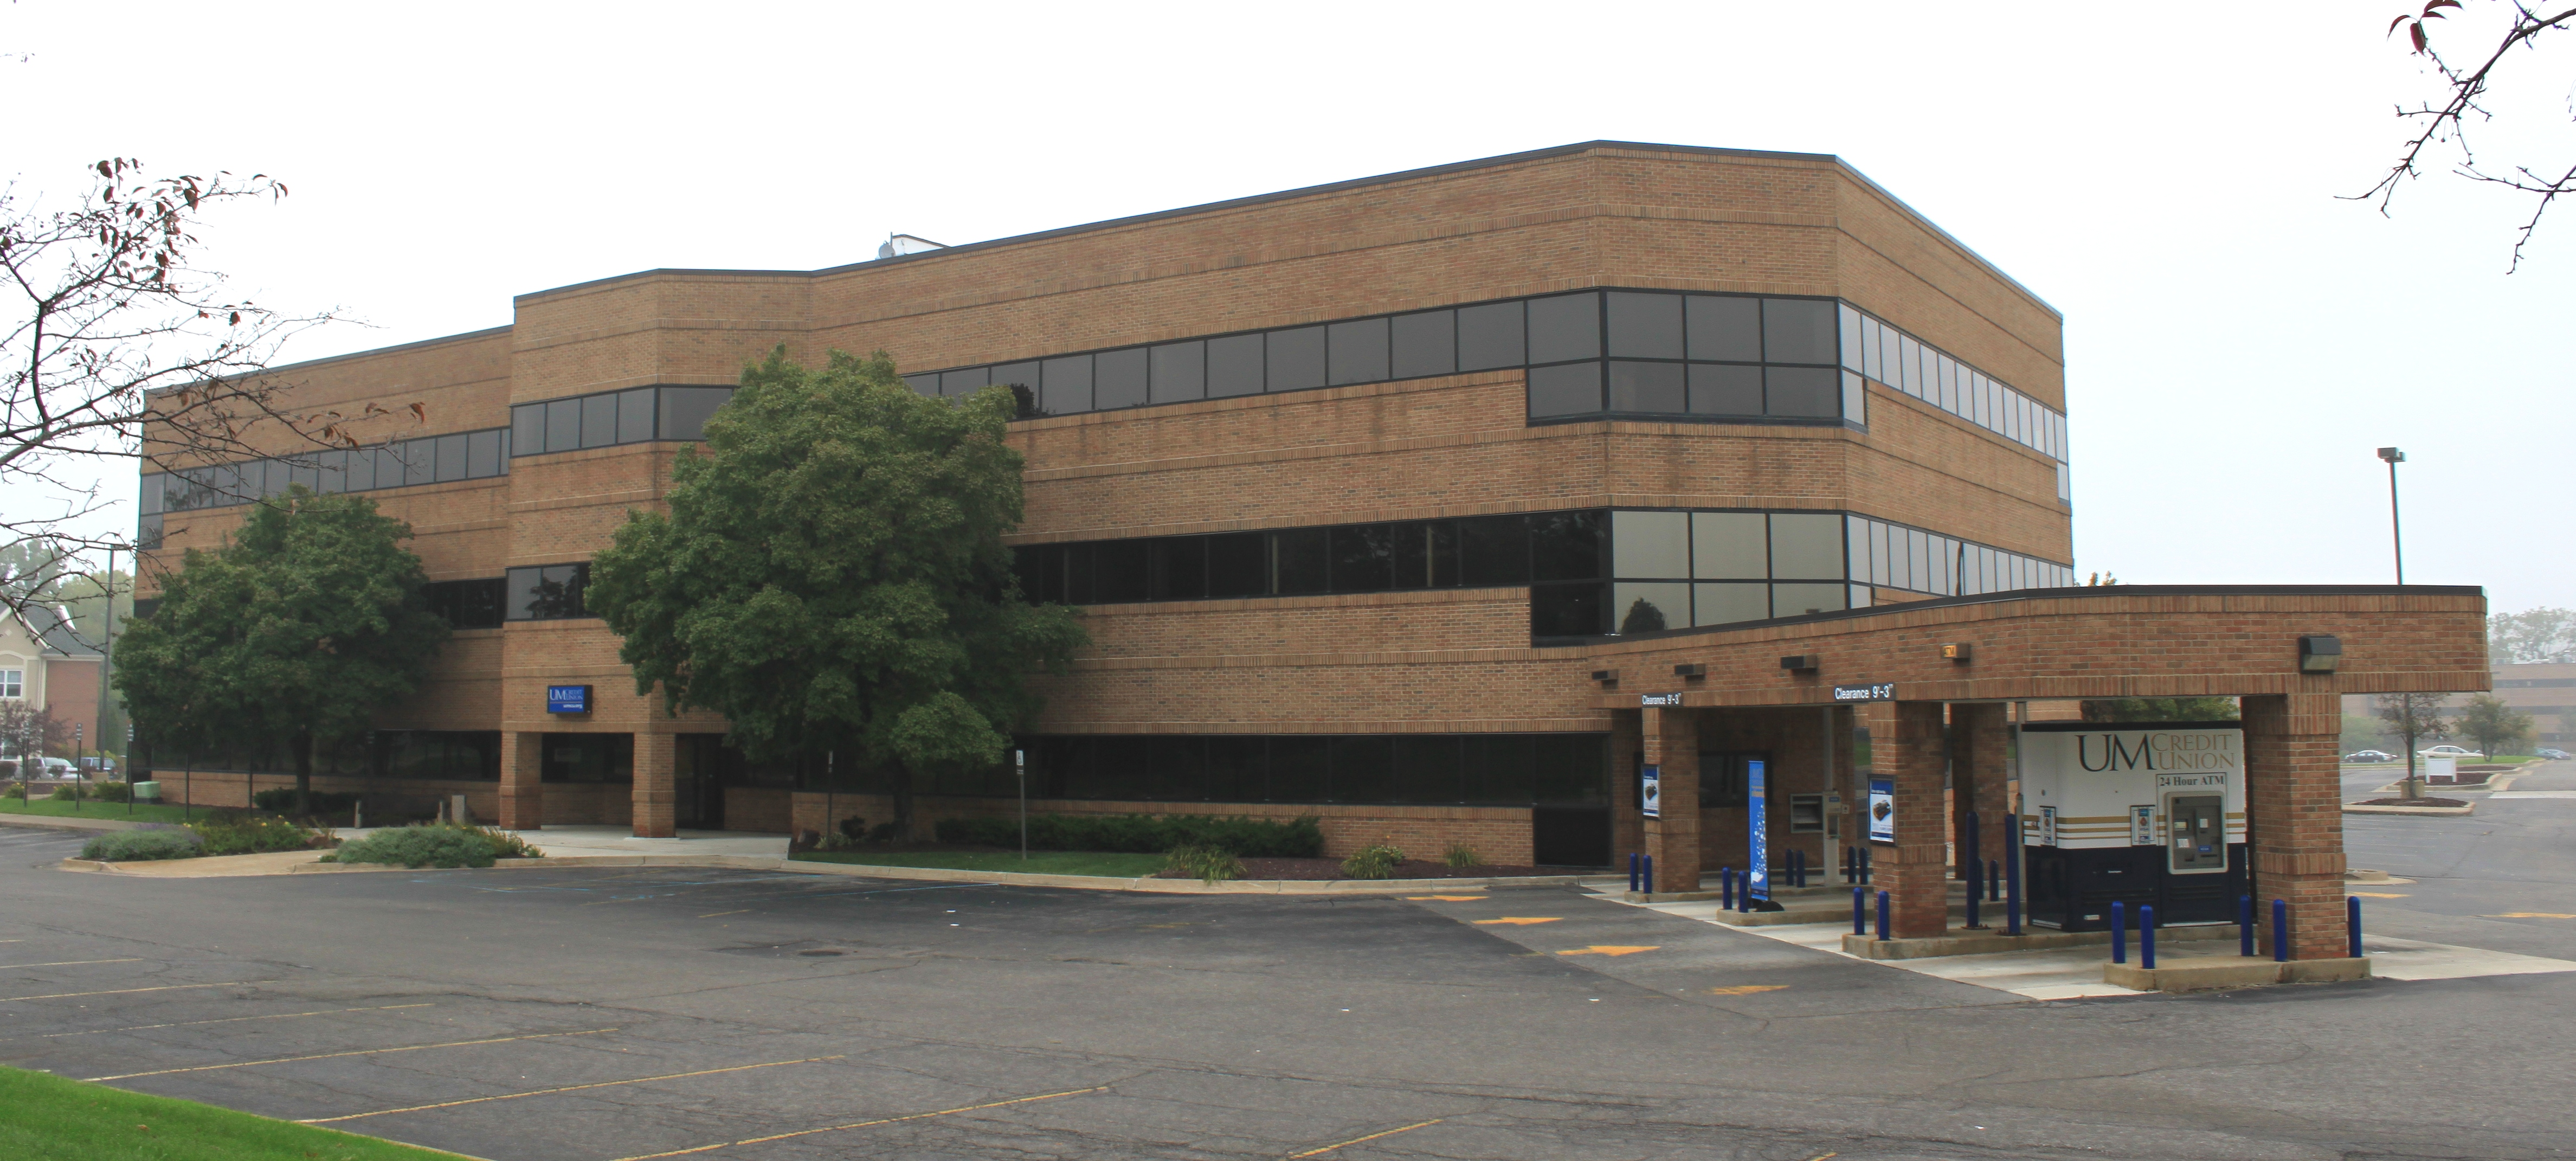 Concordia University Ann Arbor Logo Umcu e Eisenhower Branch